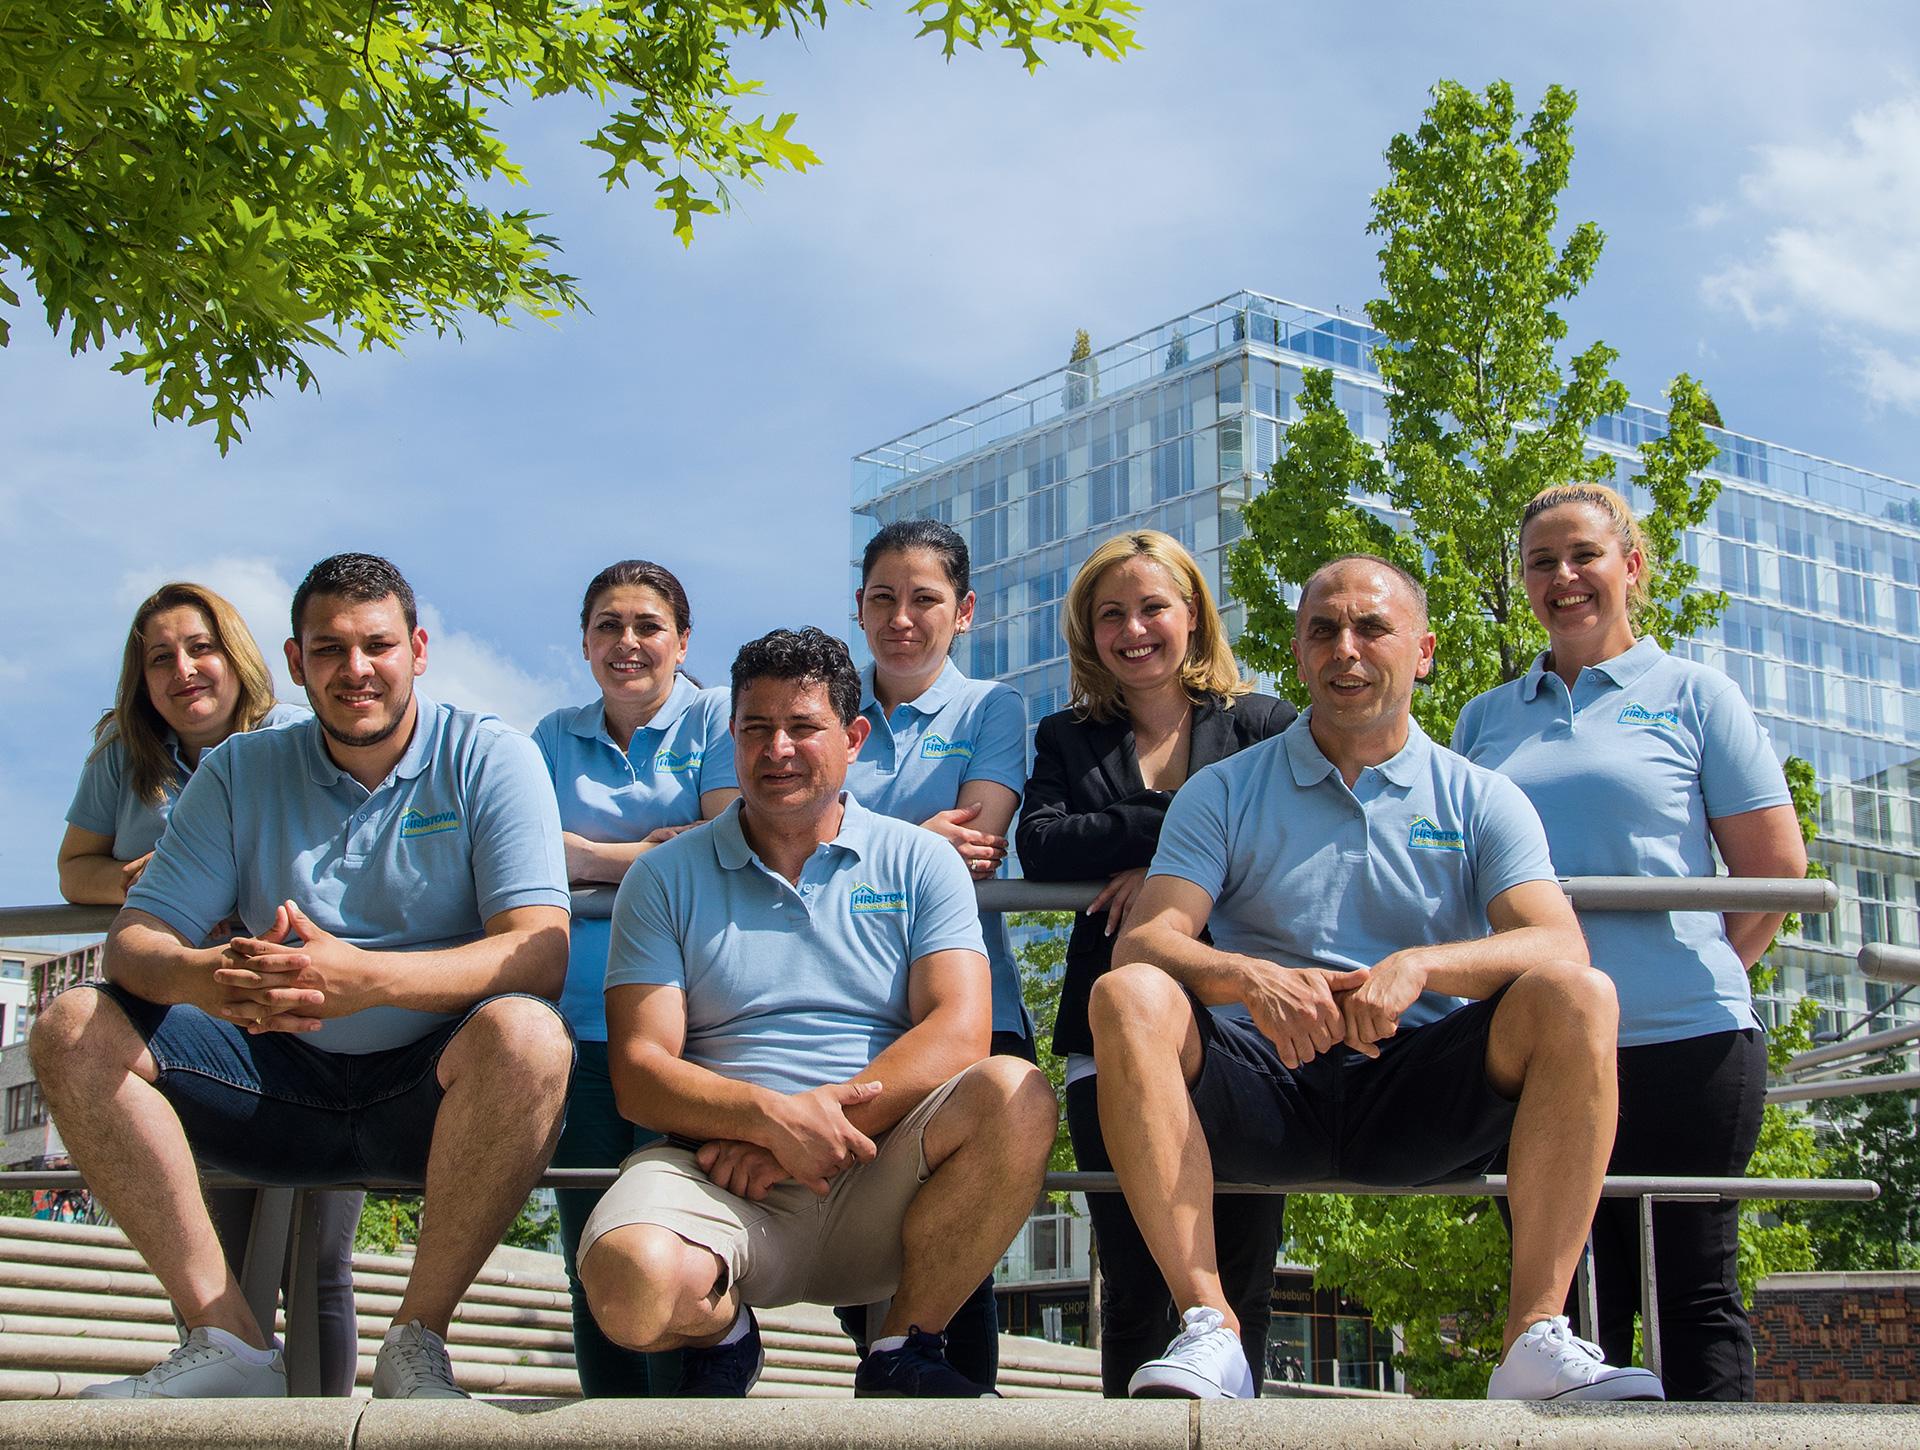 Teamphoto-Gebaeudereinigung-Hristova